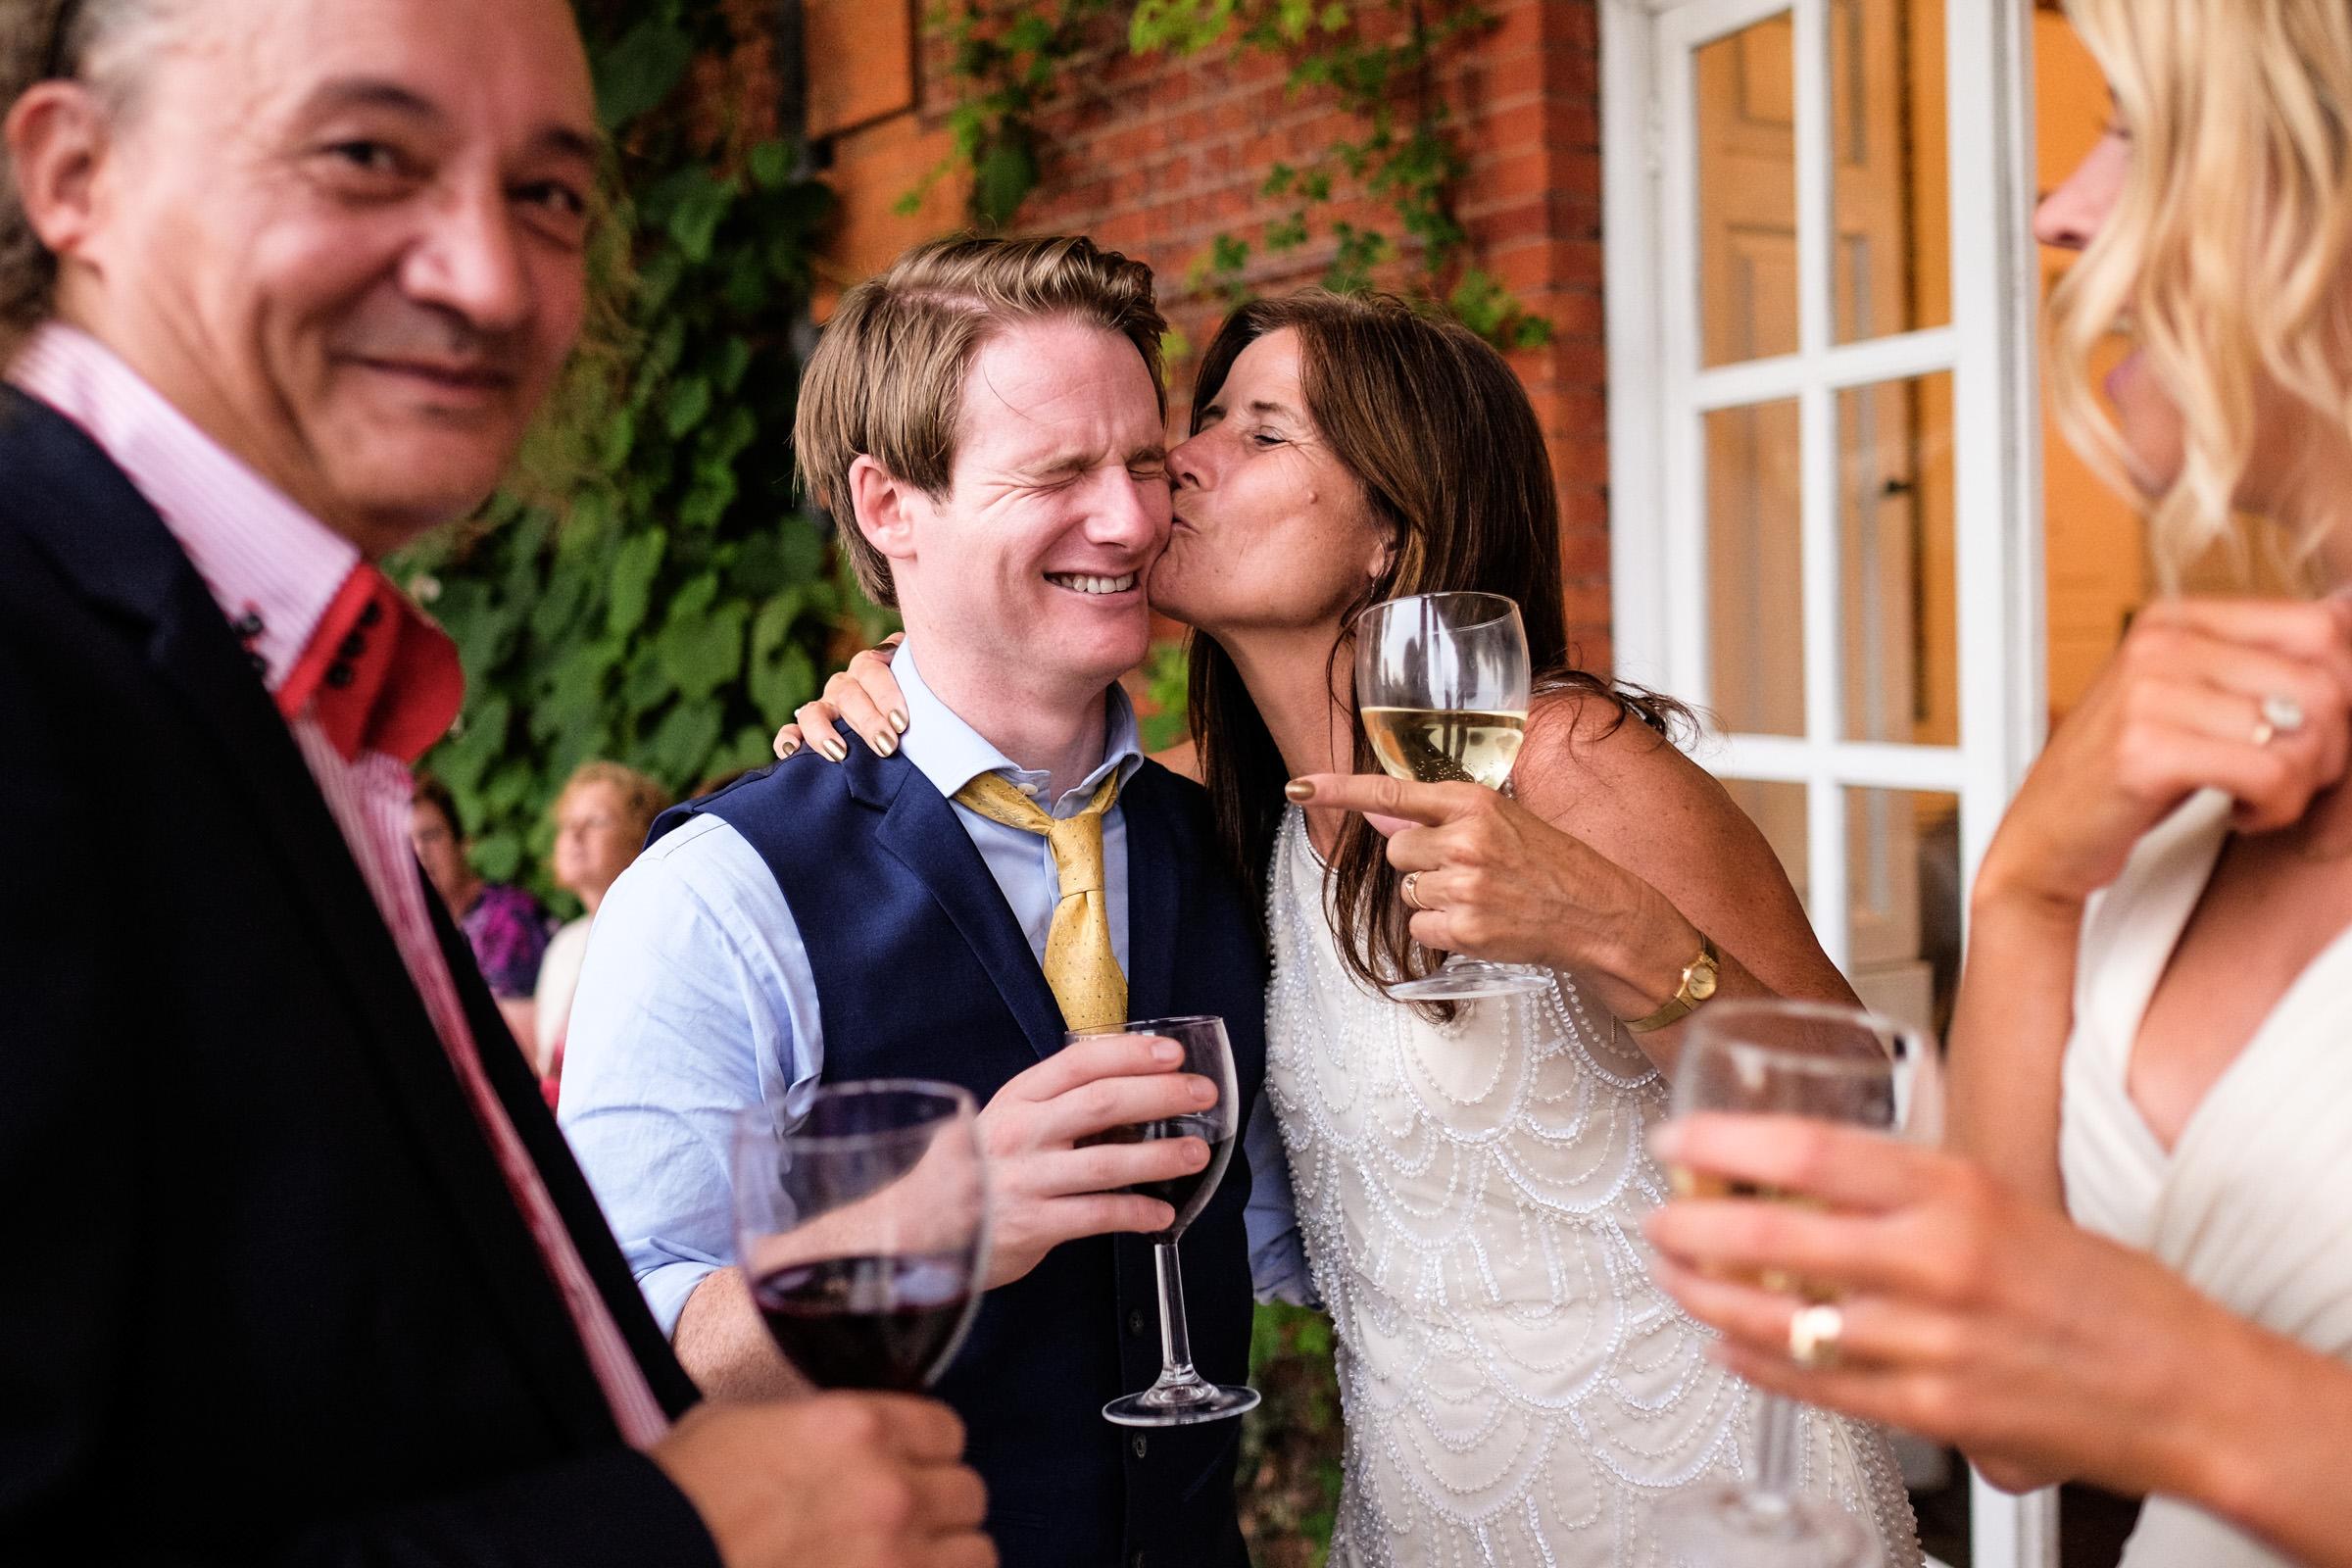 Wedding+at+Parkside+School+in+Surrey+034.jpg